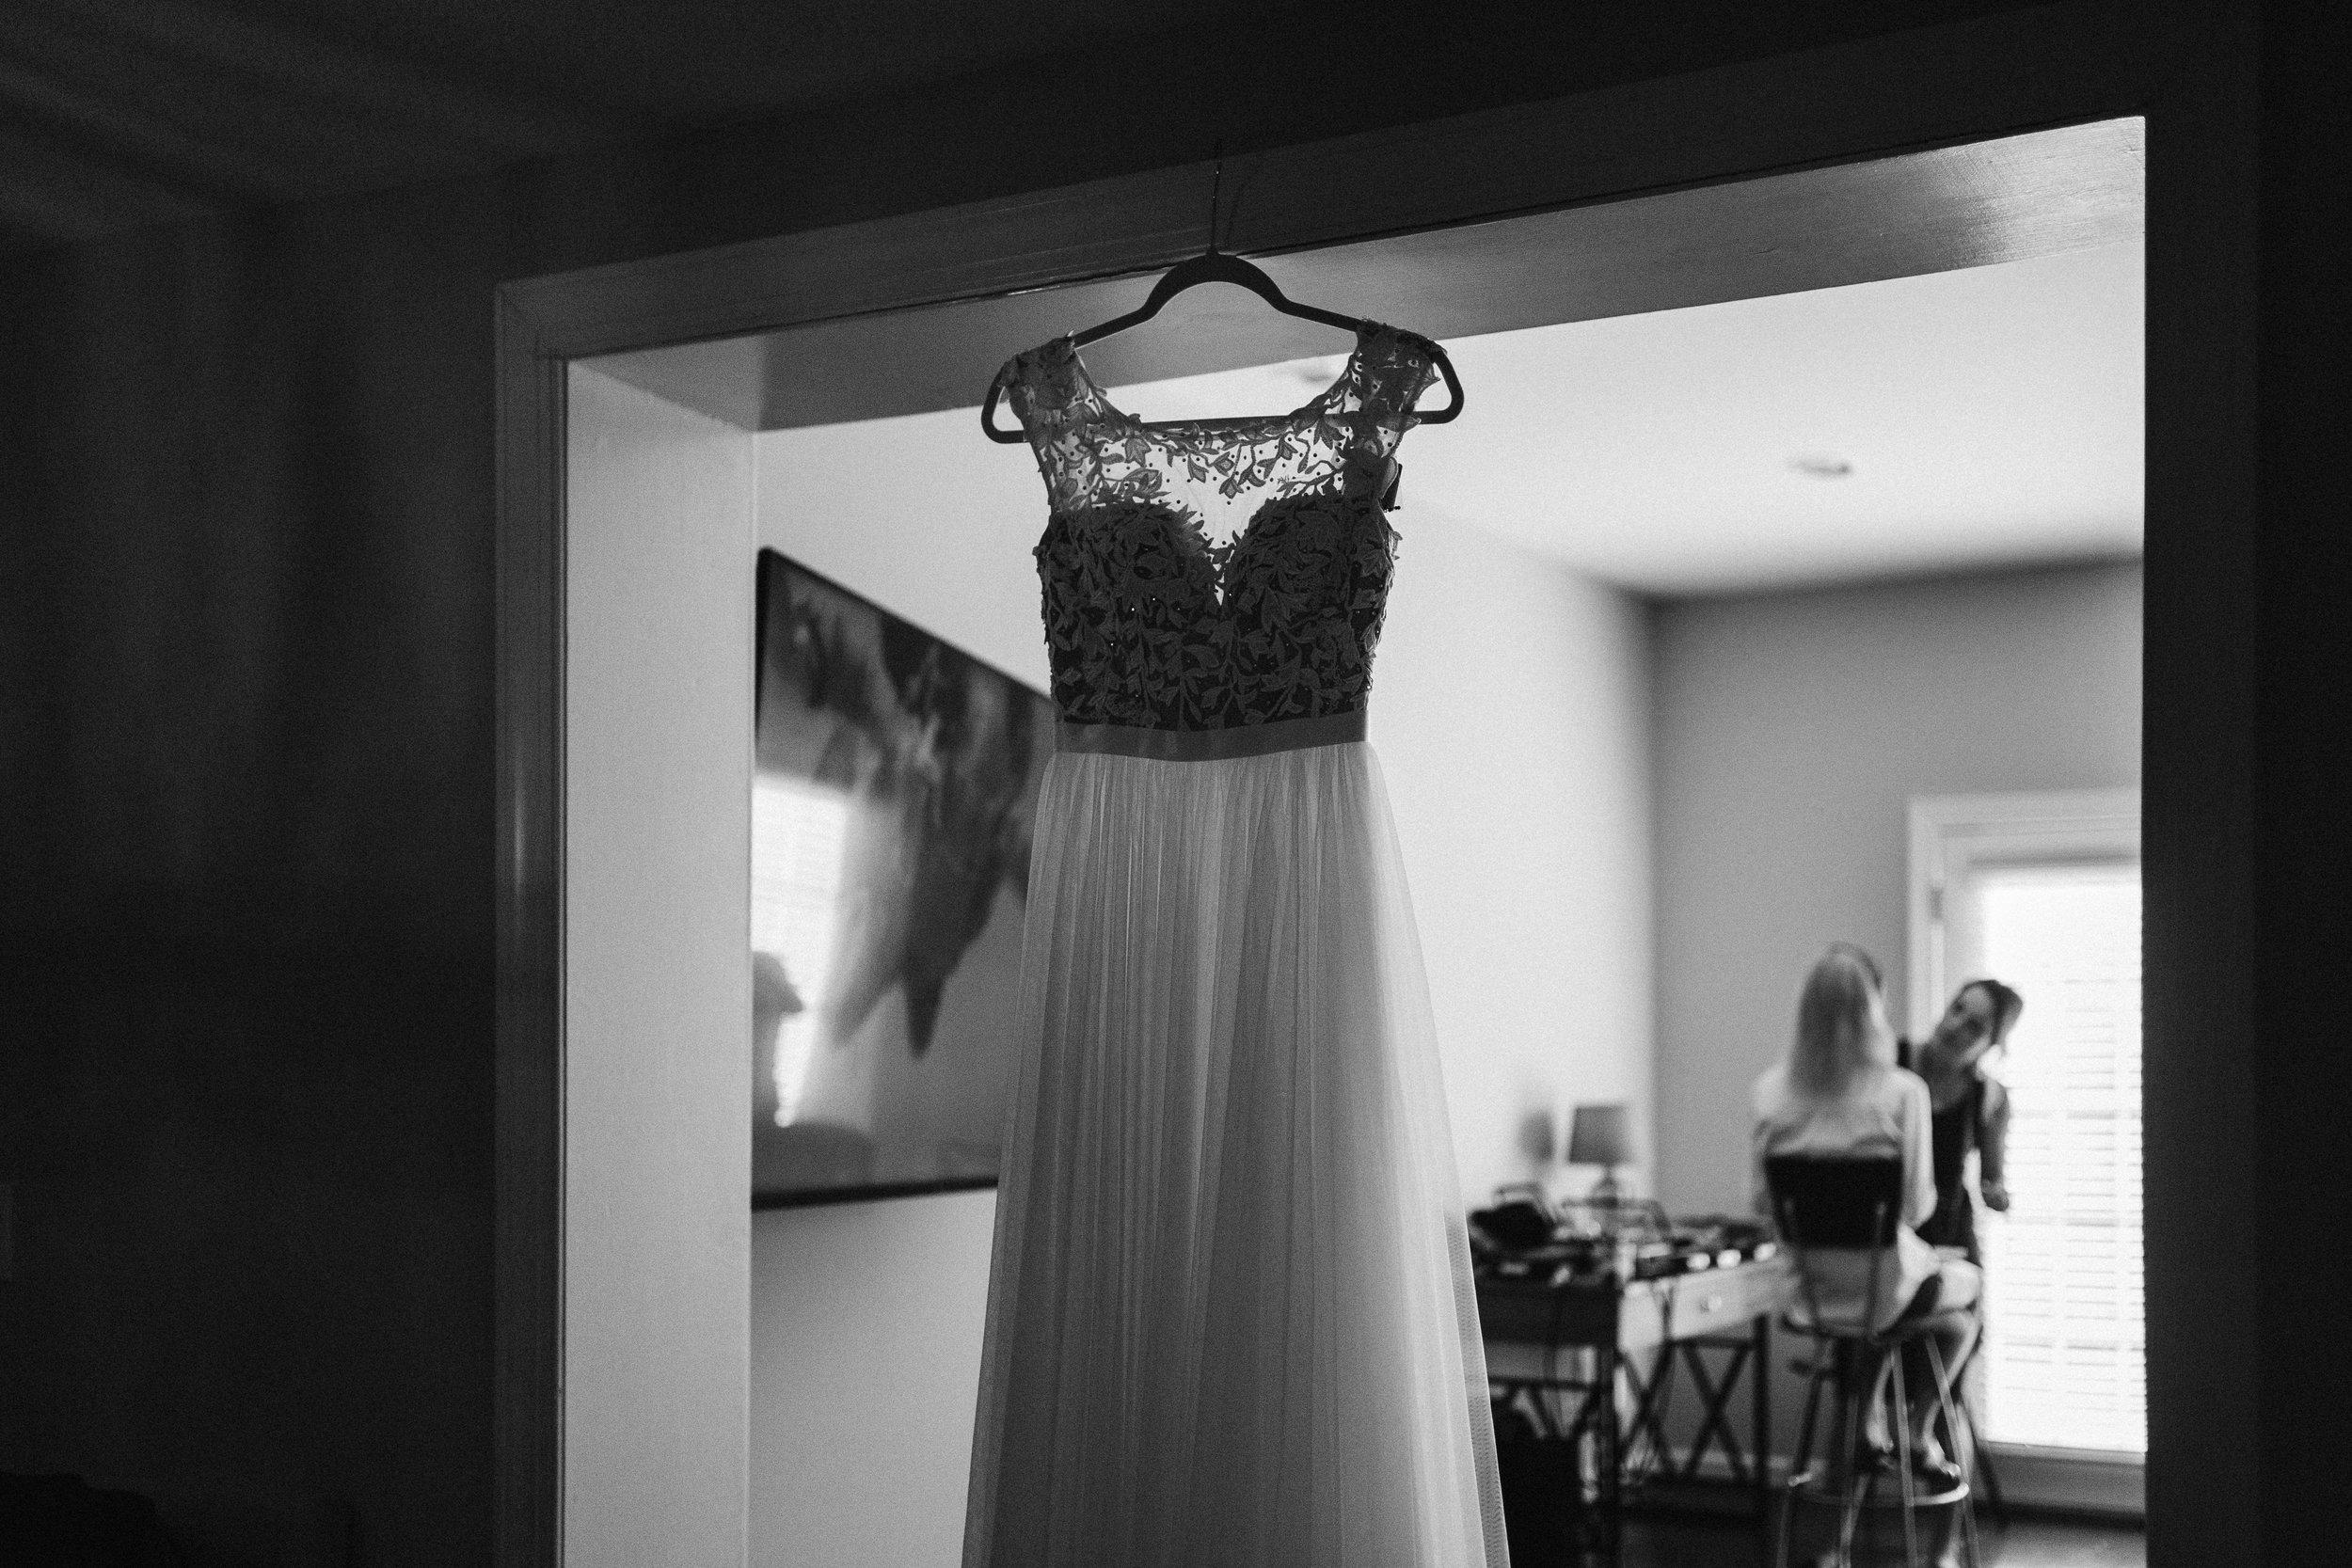 2018.09.02 Ray and Sarah Prizner Nashville TN Wedding FINALS-3.jpg